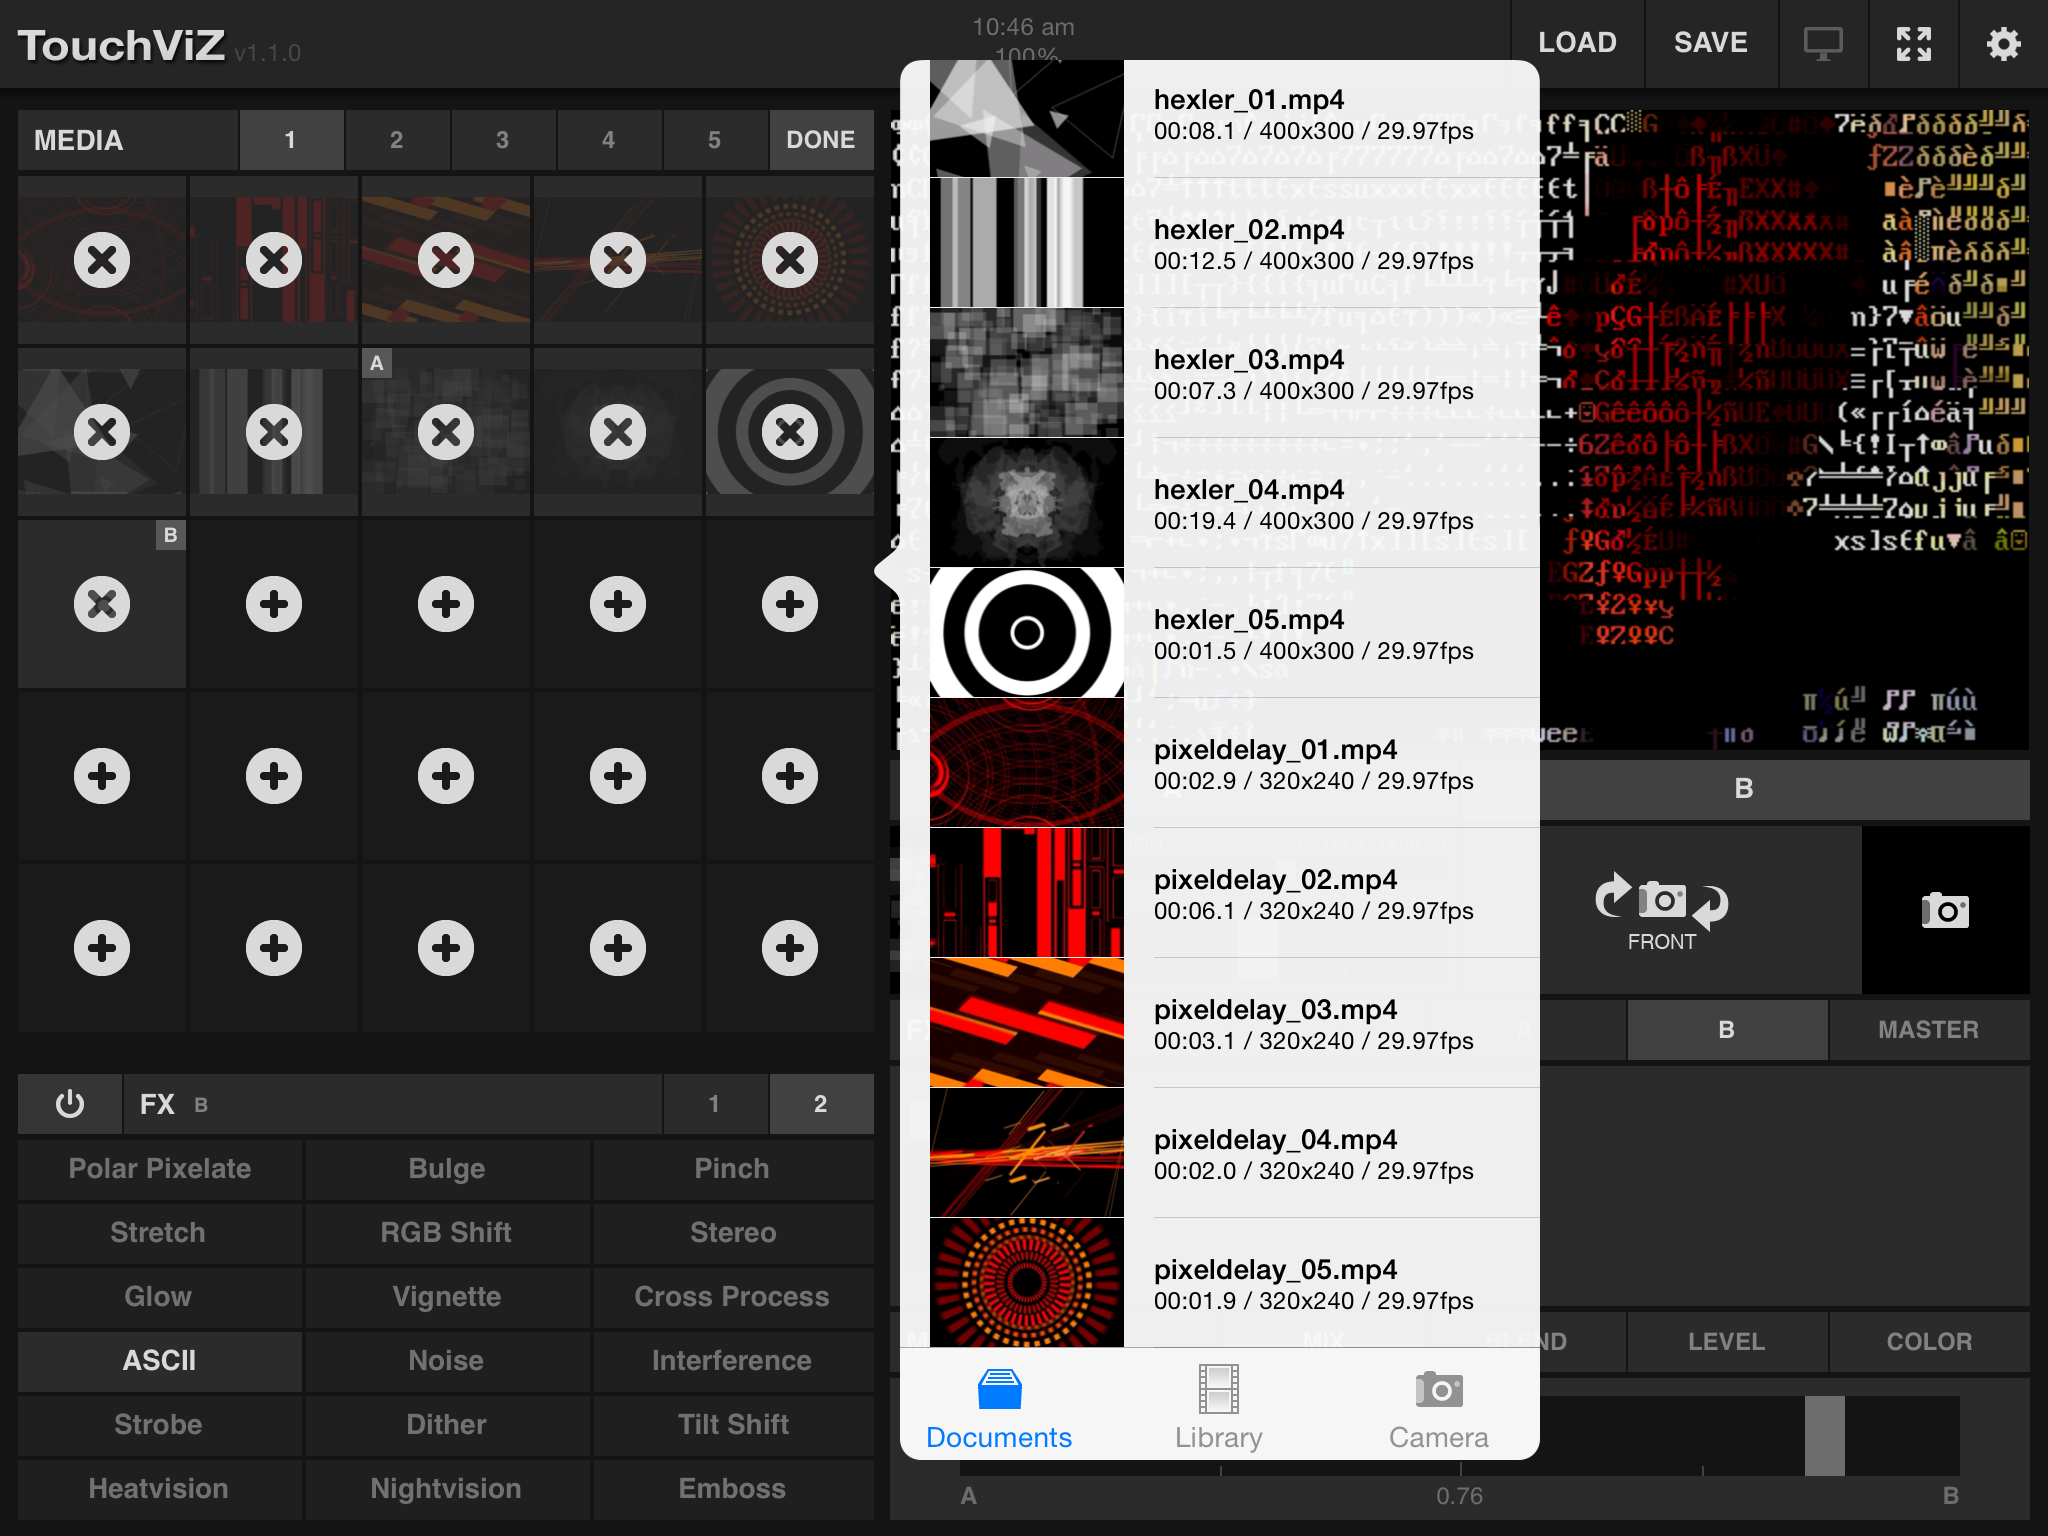 TouchViZ screen